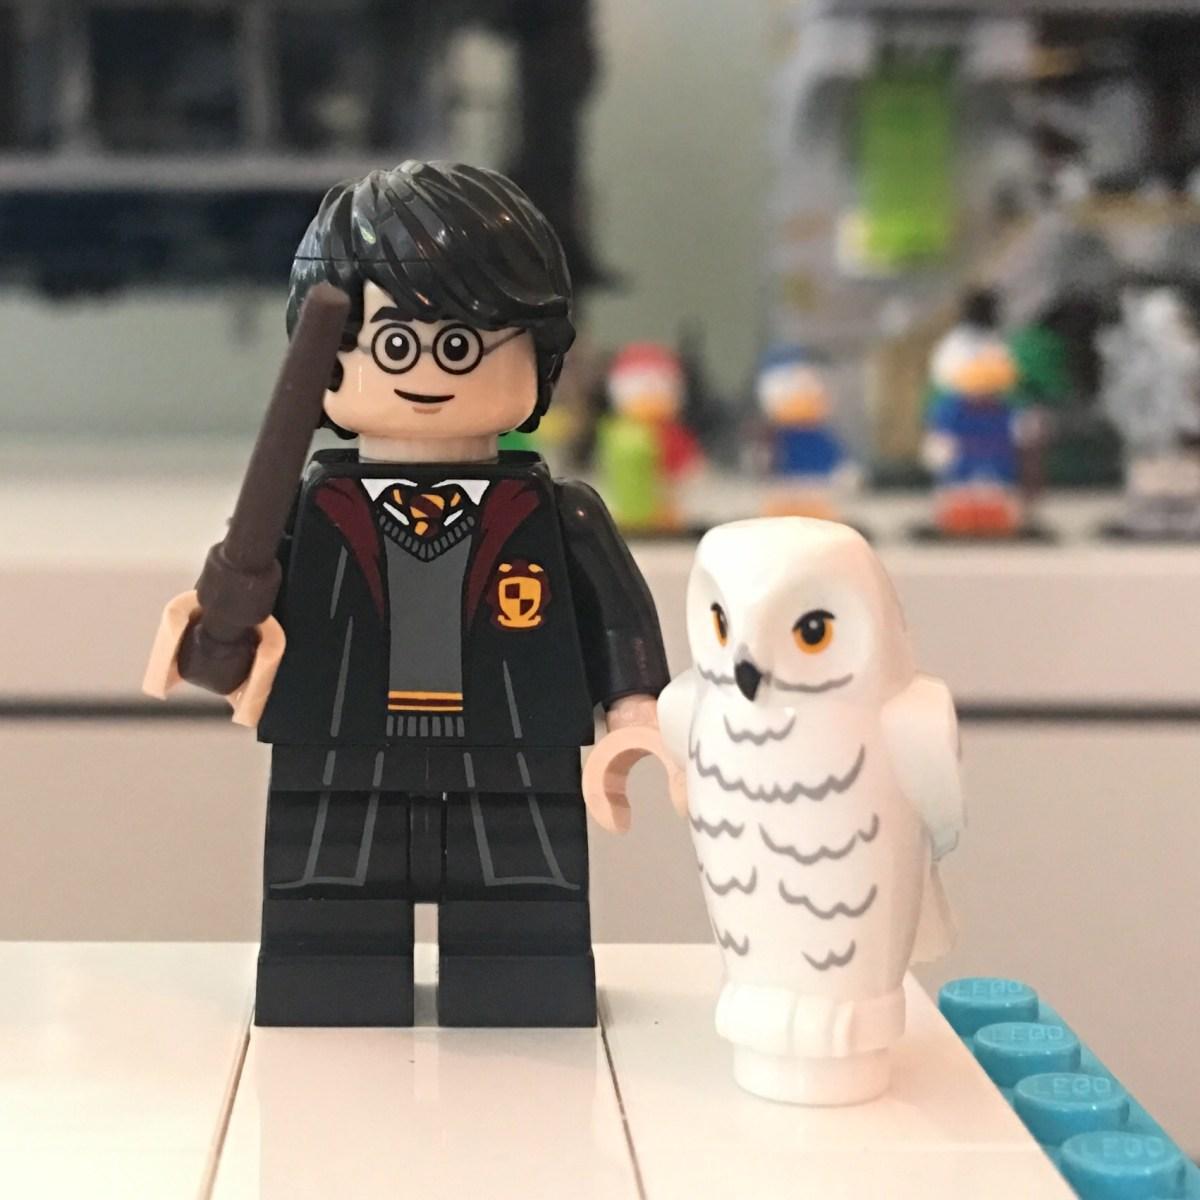 LEGO Black Tousled Harry Potter Minifig Minifigure Hair